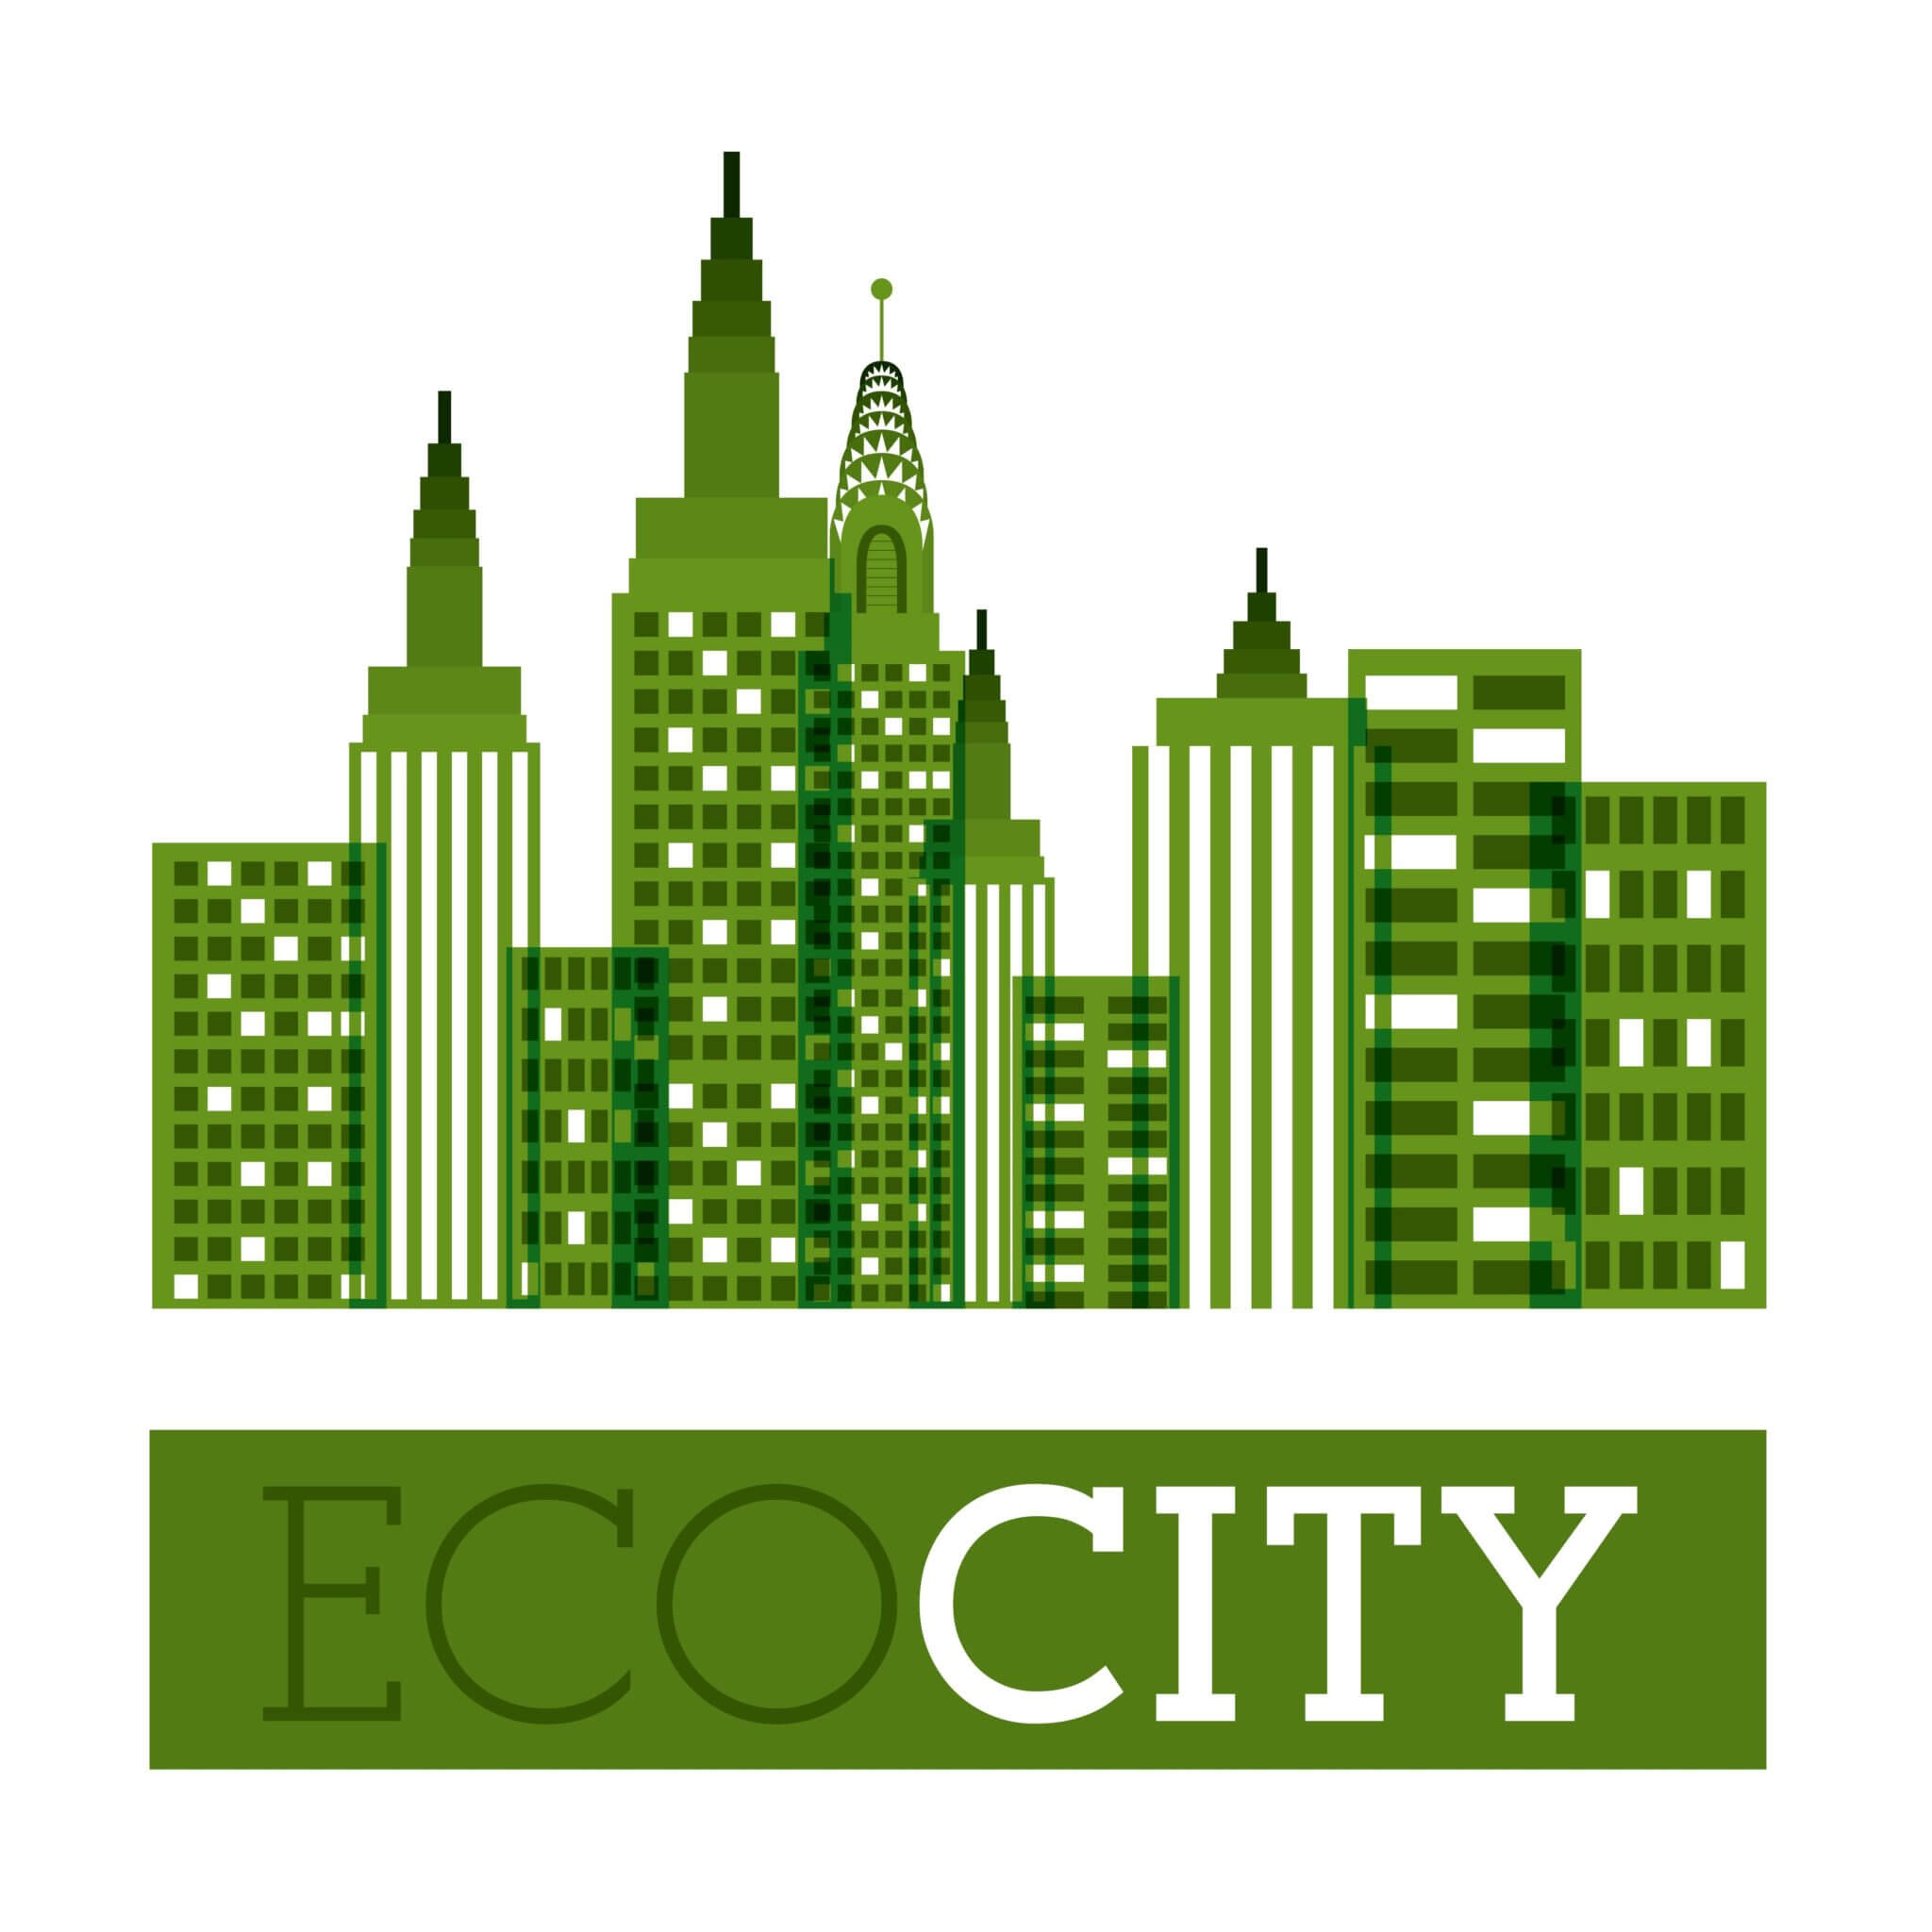 Eco City design over white background, vector illustration